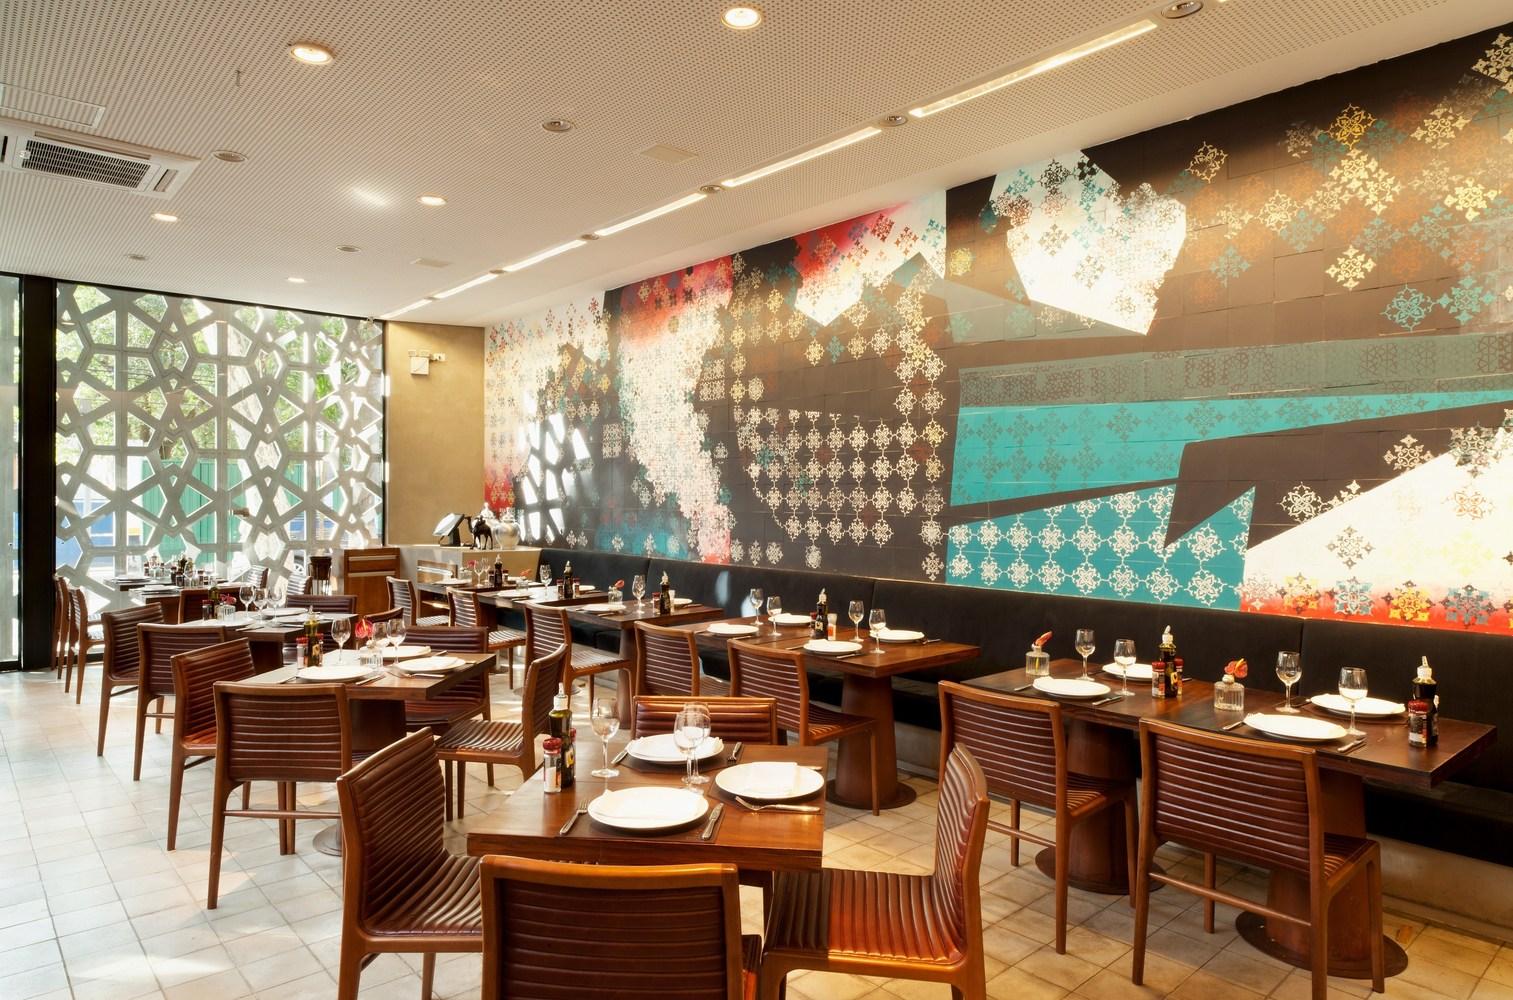 Projeto Restaurante Manish: Cadeira Allegro e Alba